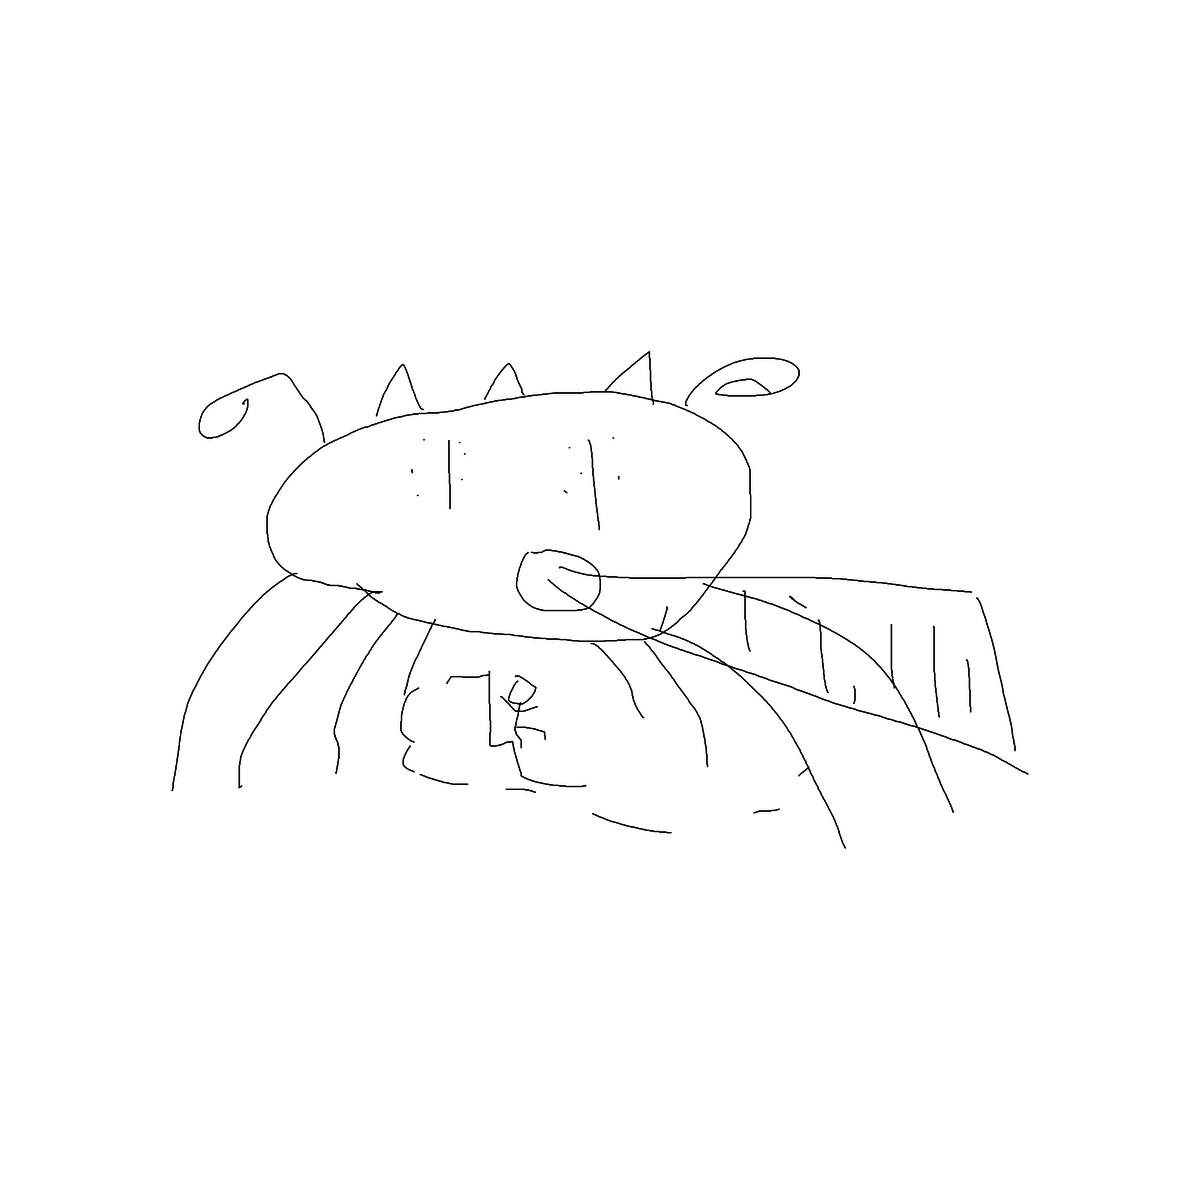 BAAAM drawing#16143 lat:-23.4598674774169920lng: 133.5835266113281200